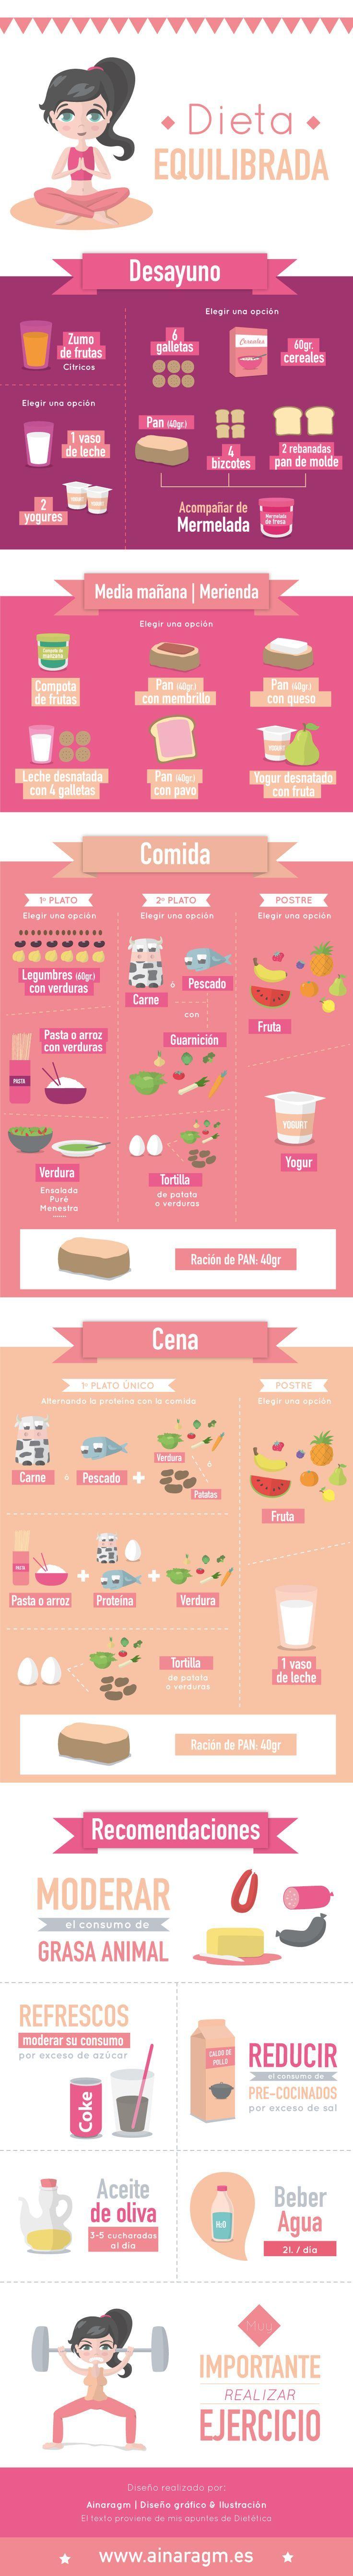 Infrografia de Una Dieta Equilibrada.. http://www.gorditosenlucha.com/                                                                                                                                                      Más